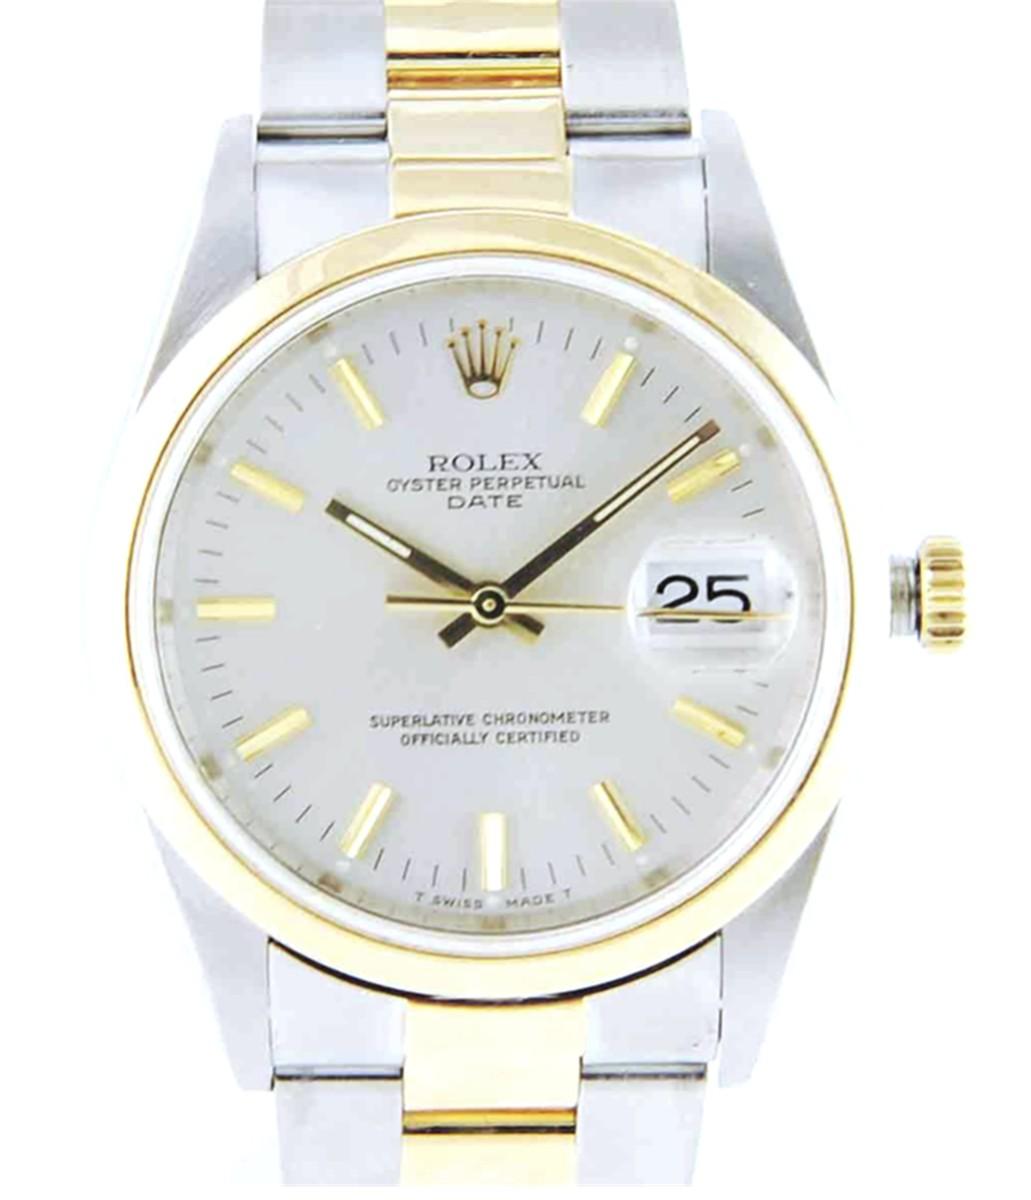 Rolex 34mm Date watch Model# 15203